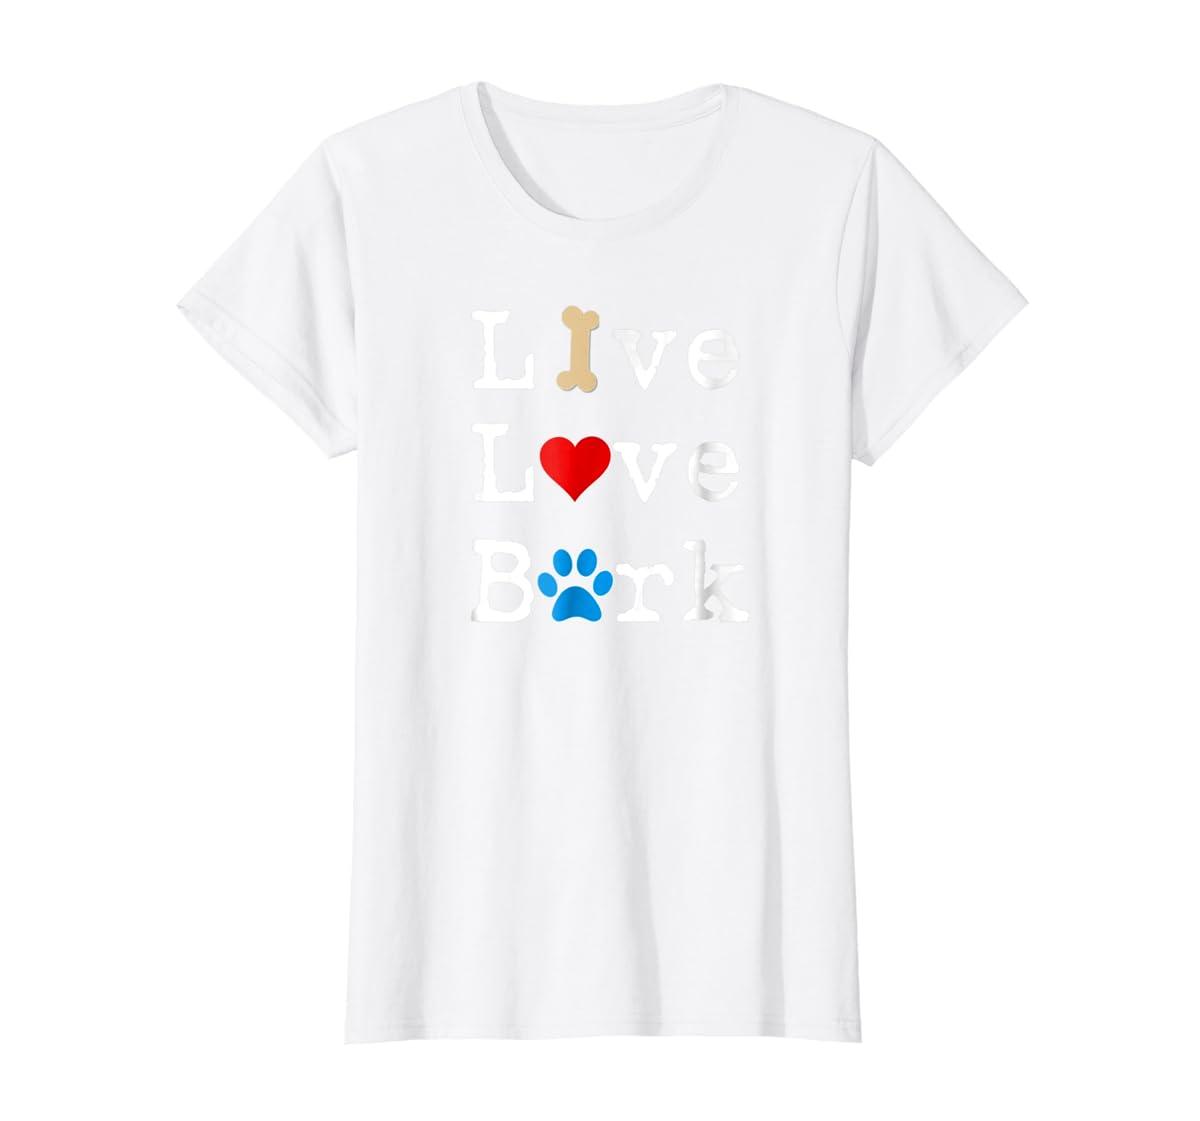 Live Love Bark T-Shirt-Women's T-Shirt-White